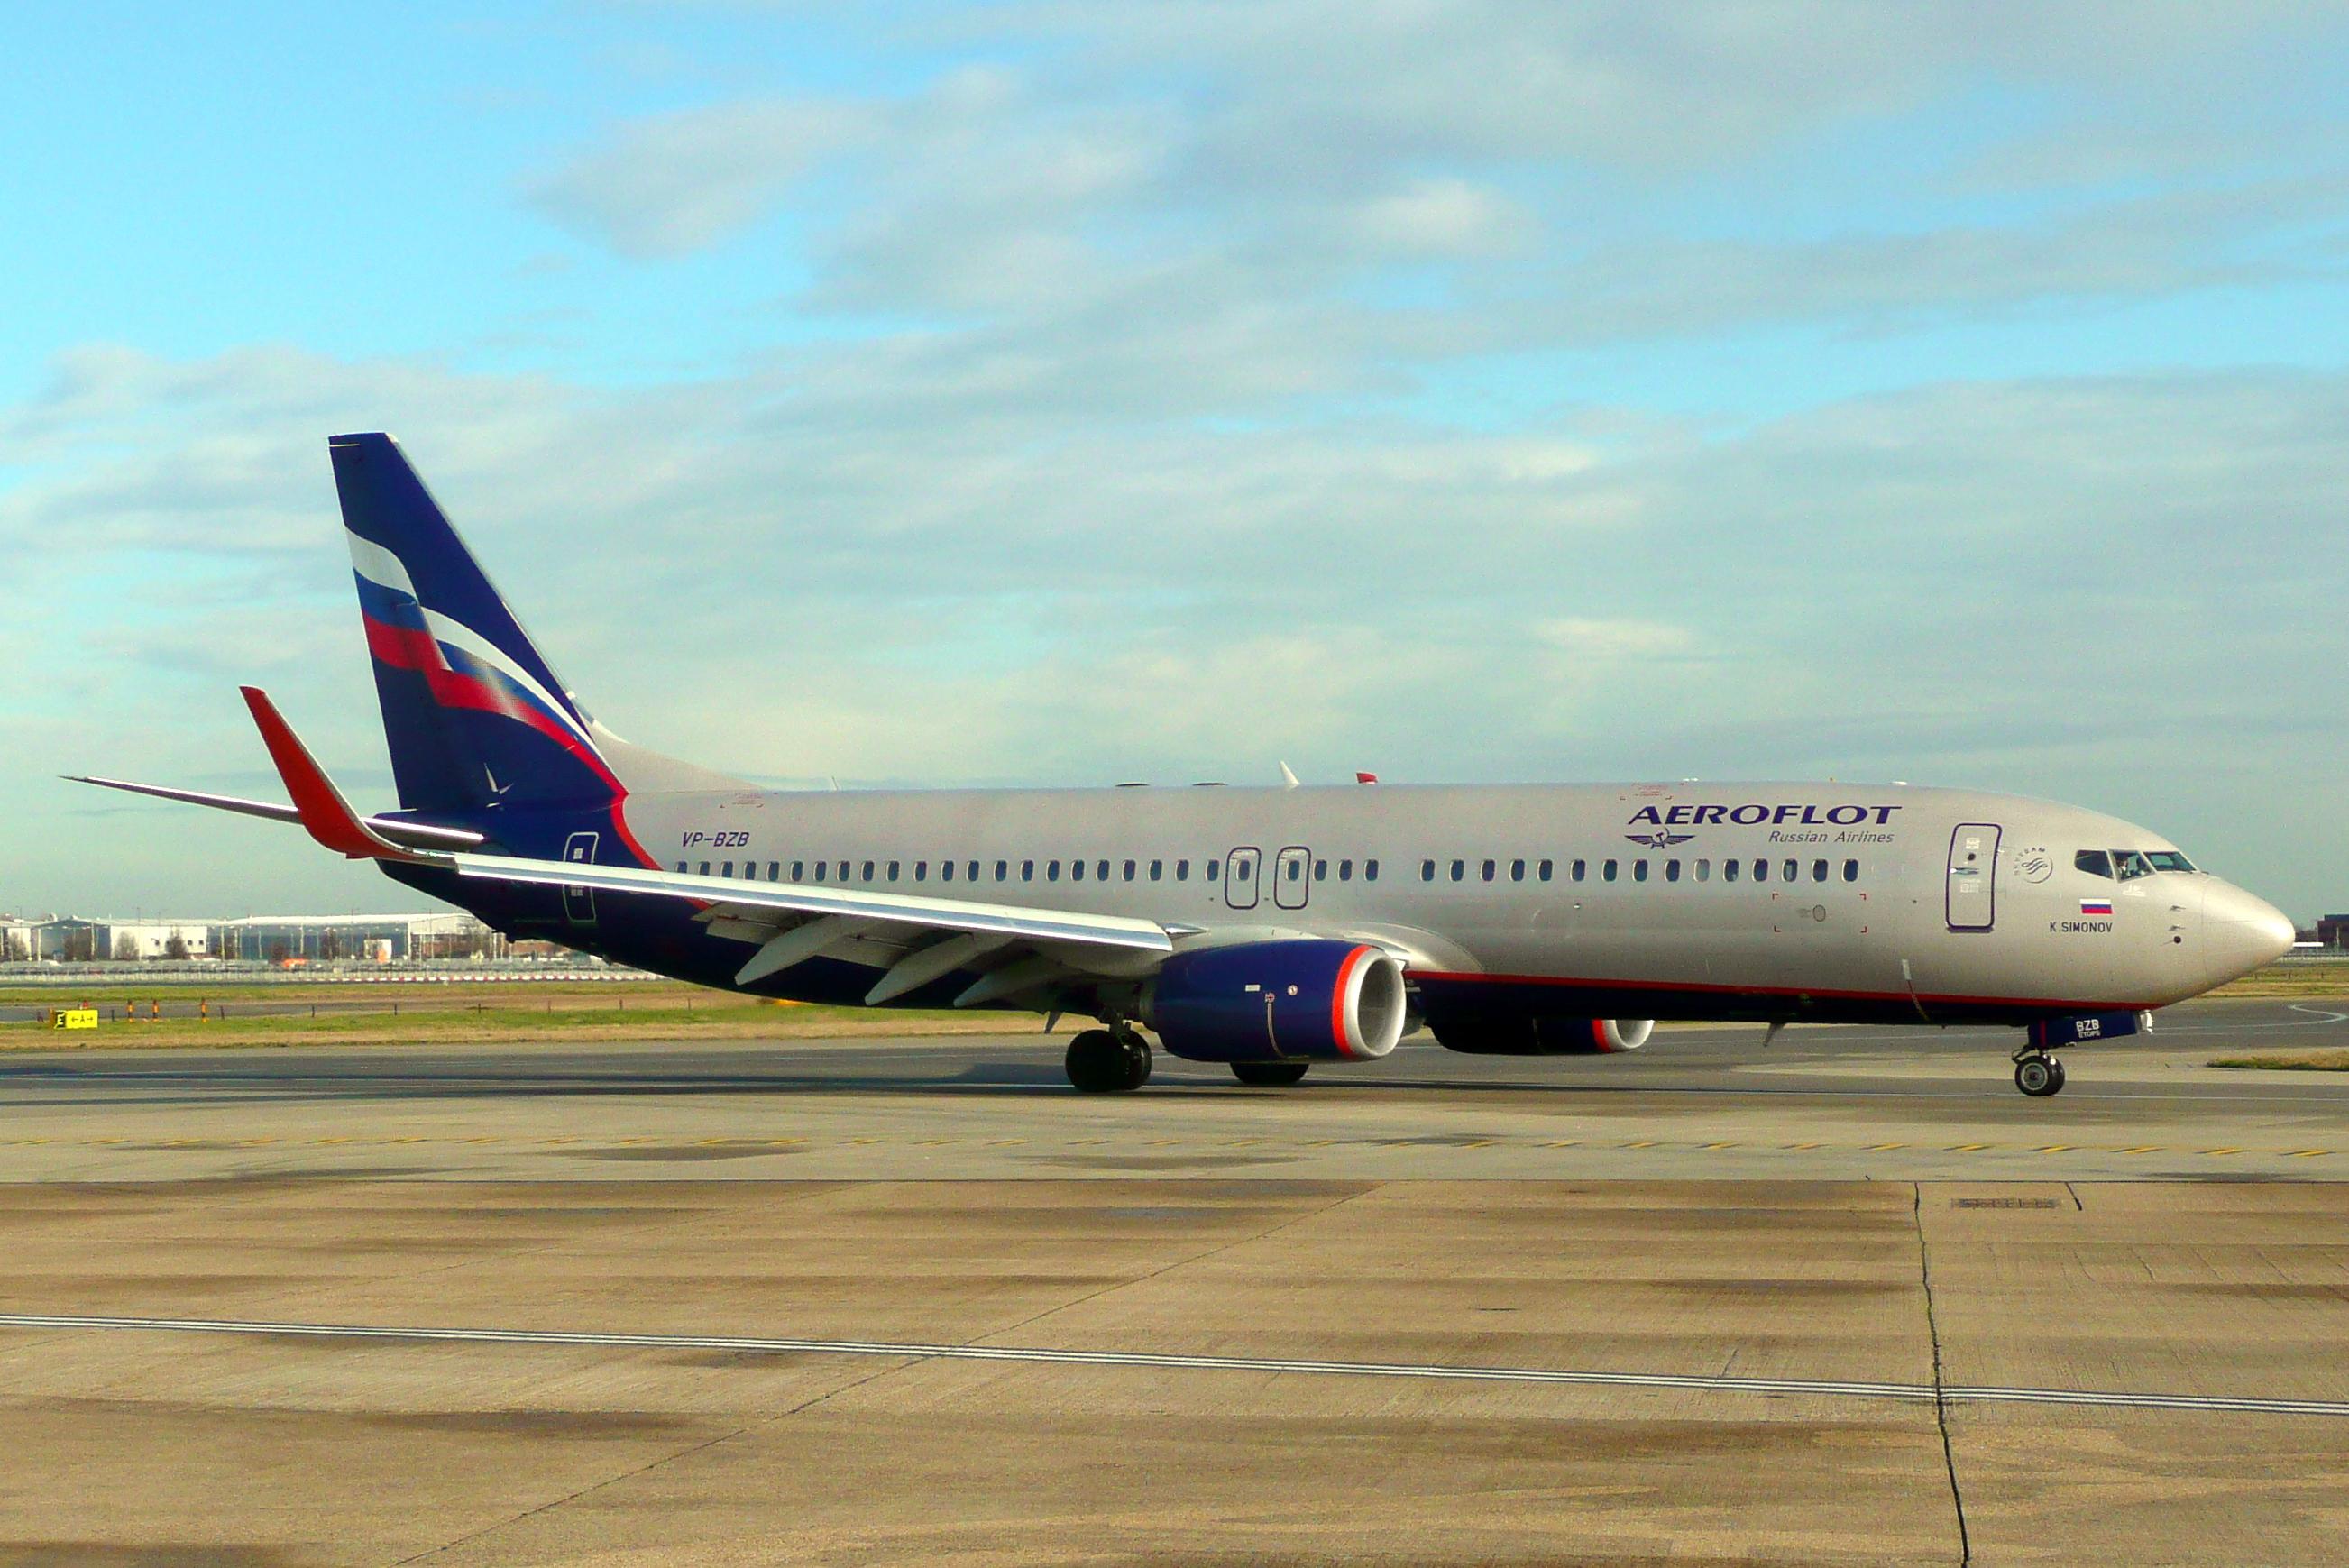 En Boeing 737-800 fra det russiske flyselskab Aeroflot. Foto: John Taggart